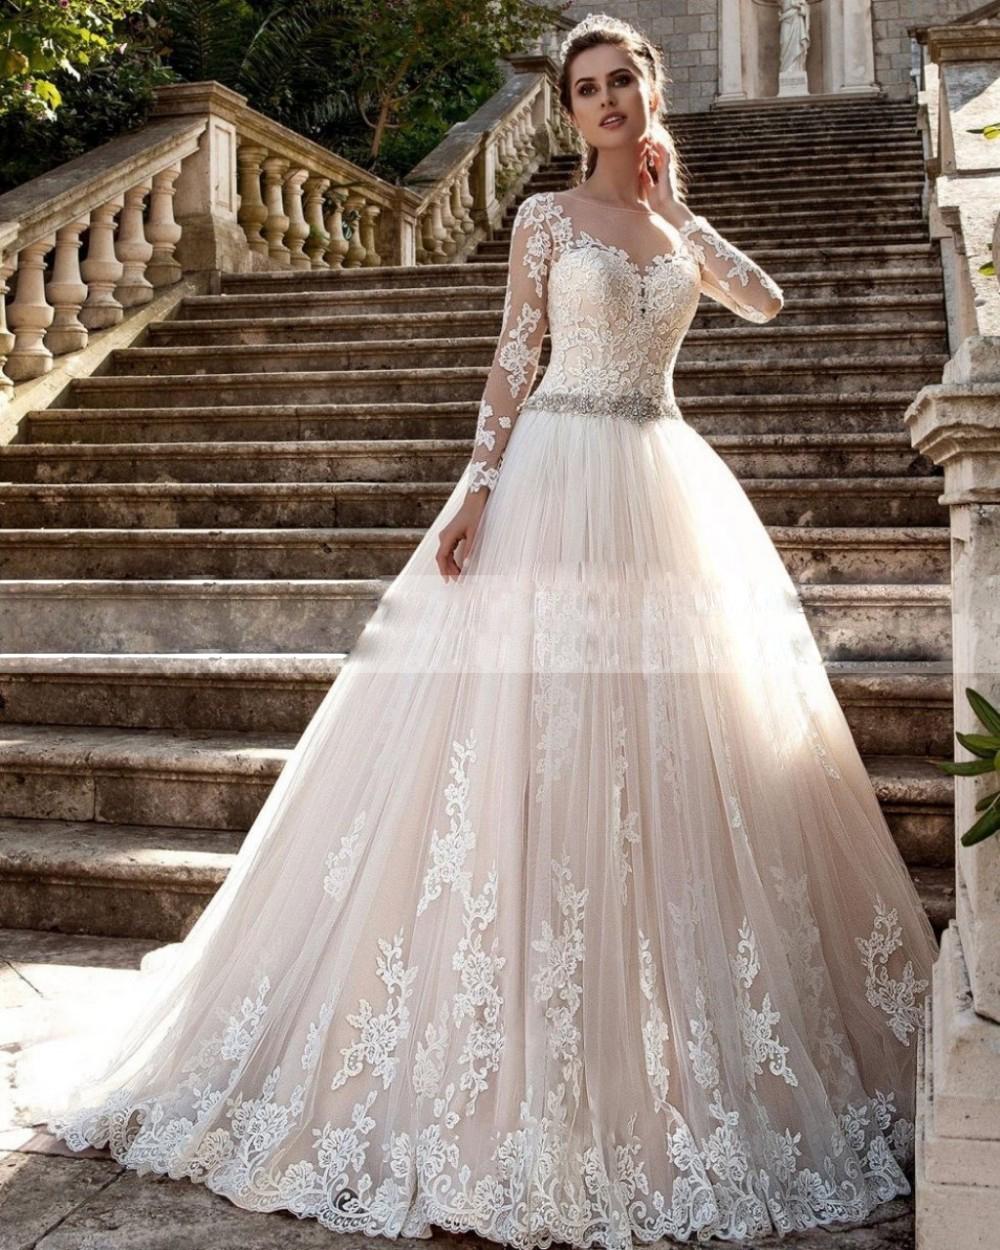 Wedding Dresses Vintage Long Sleeves Vestido de noiva Sheer Tulle Back Lace Appliques Wedding Gowns Bead Belt Bride Dresses Boda(China (Mainland))